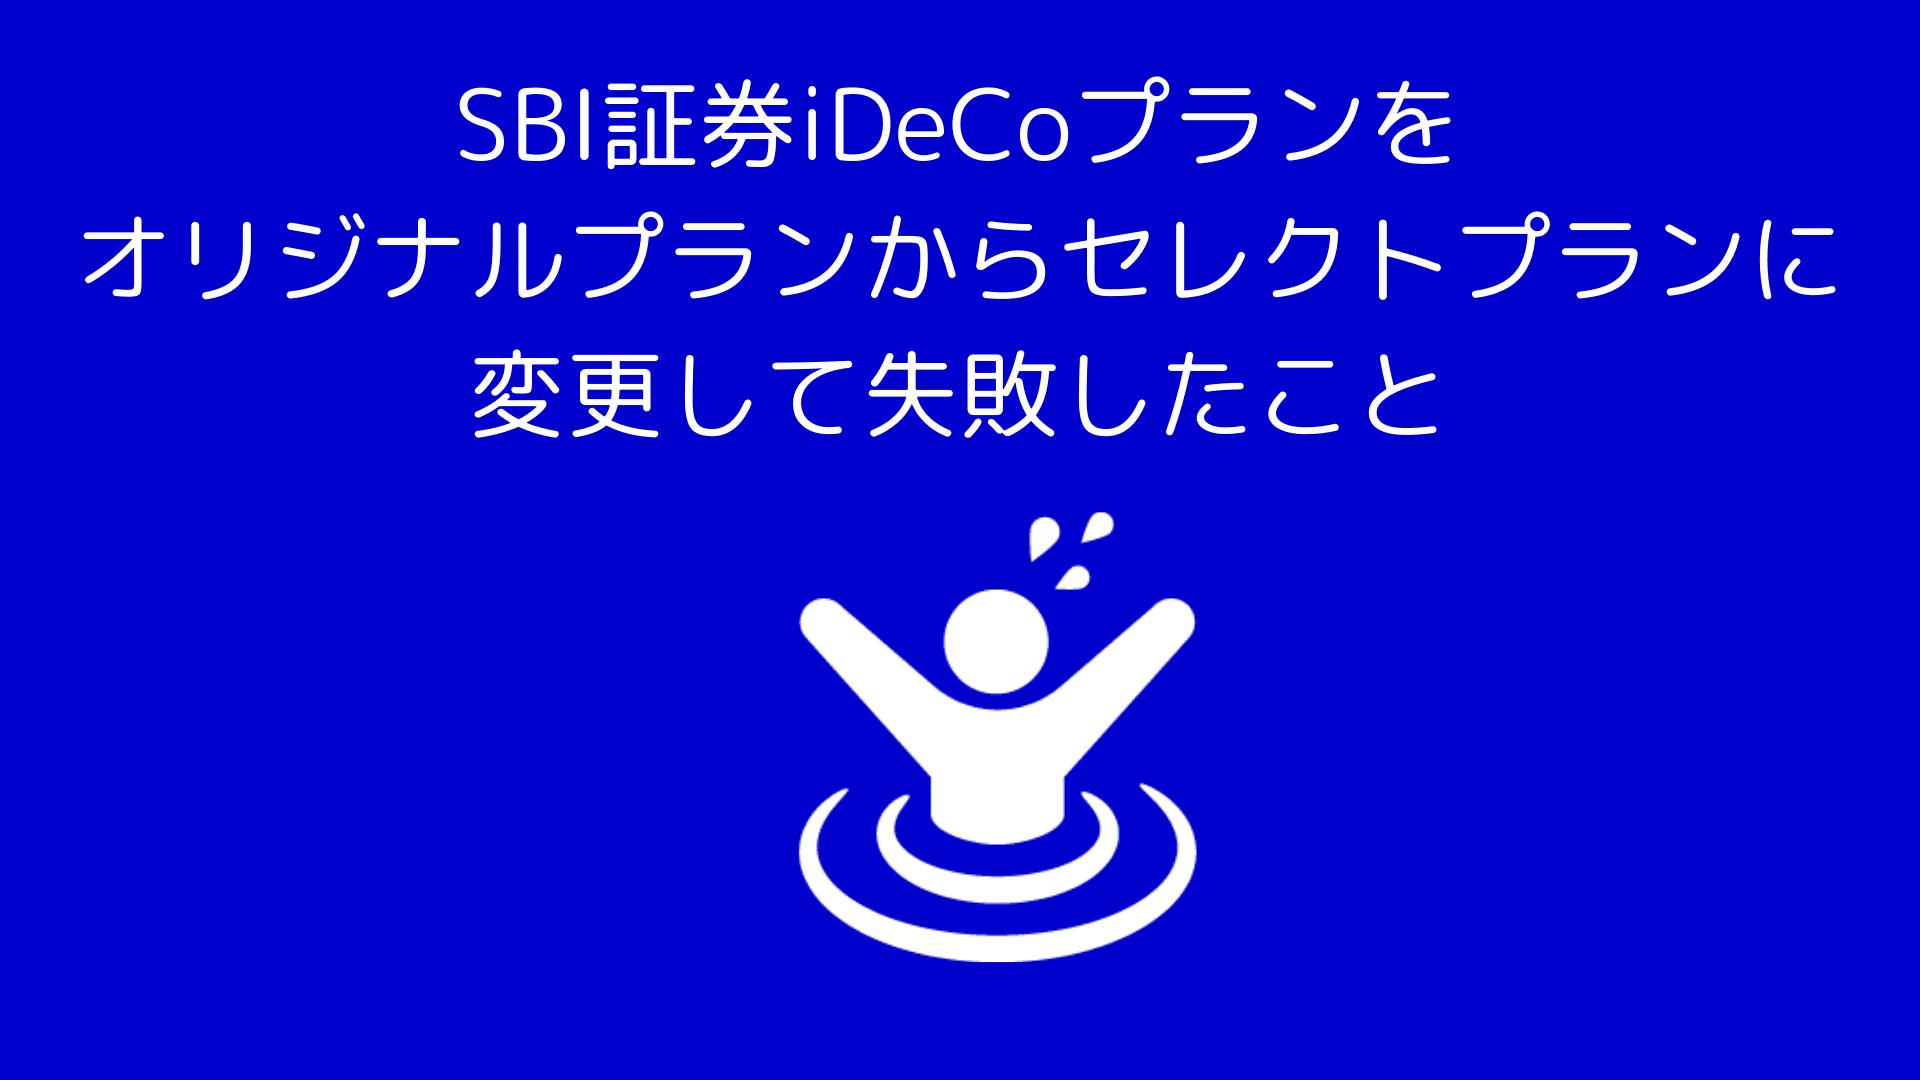 SBI証券iDeCoプランをオリジナルプランからセレクトプランに変更して失敗したこと